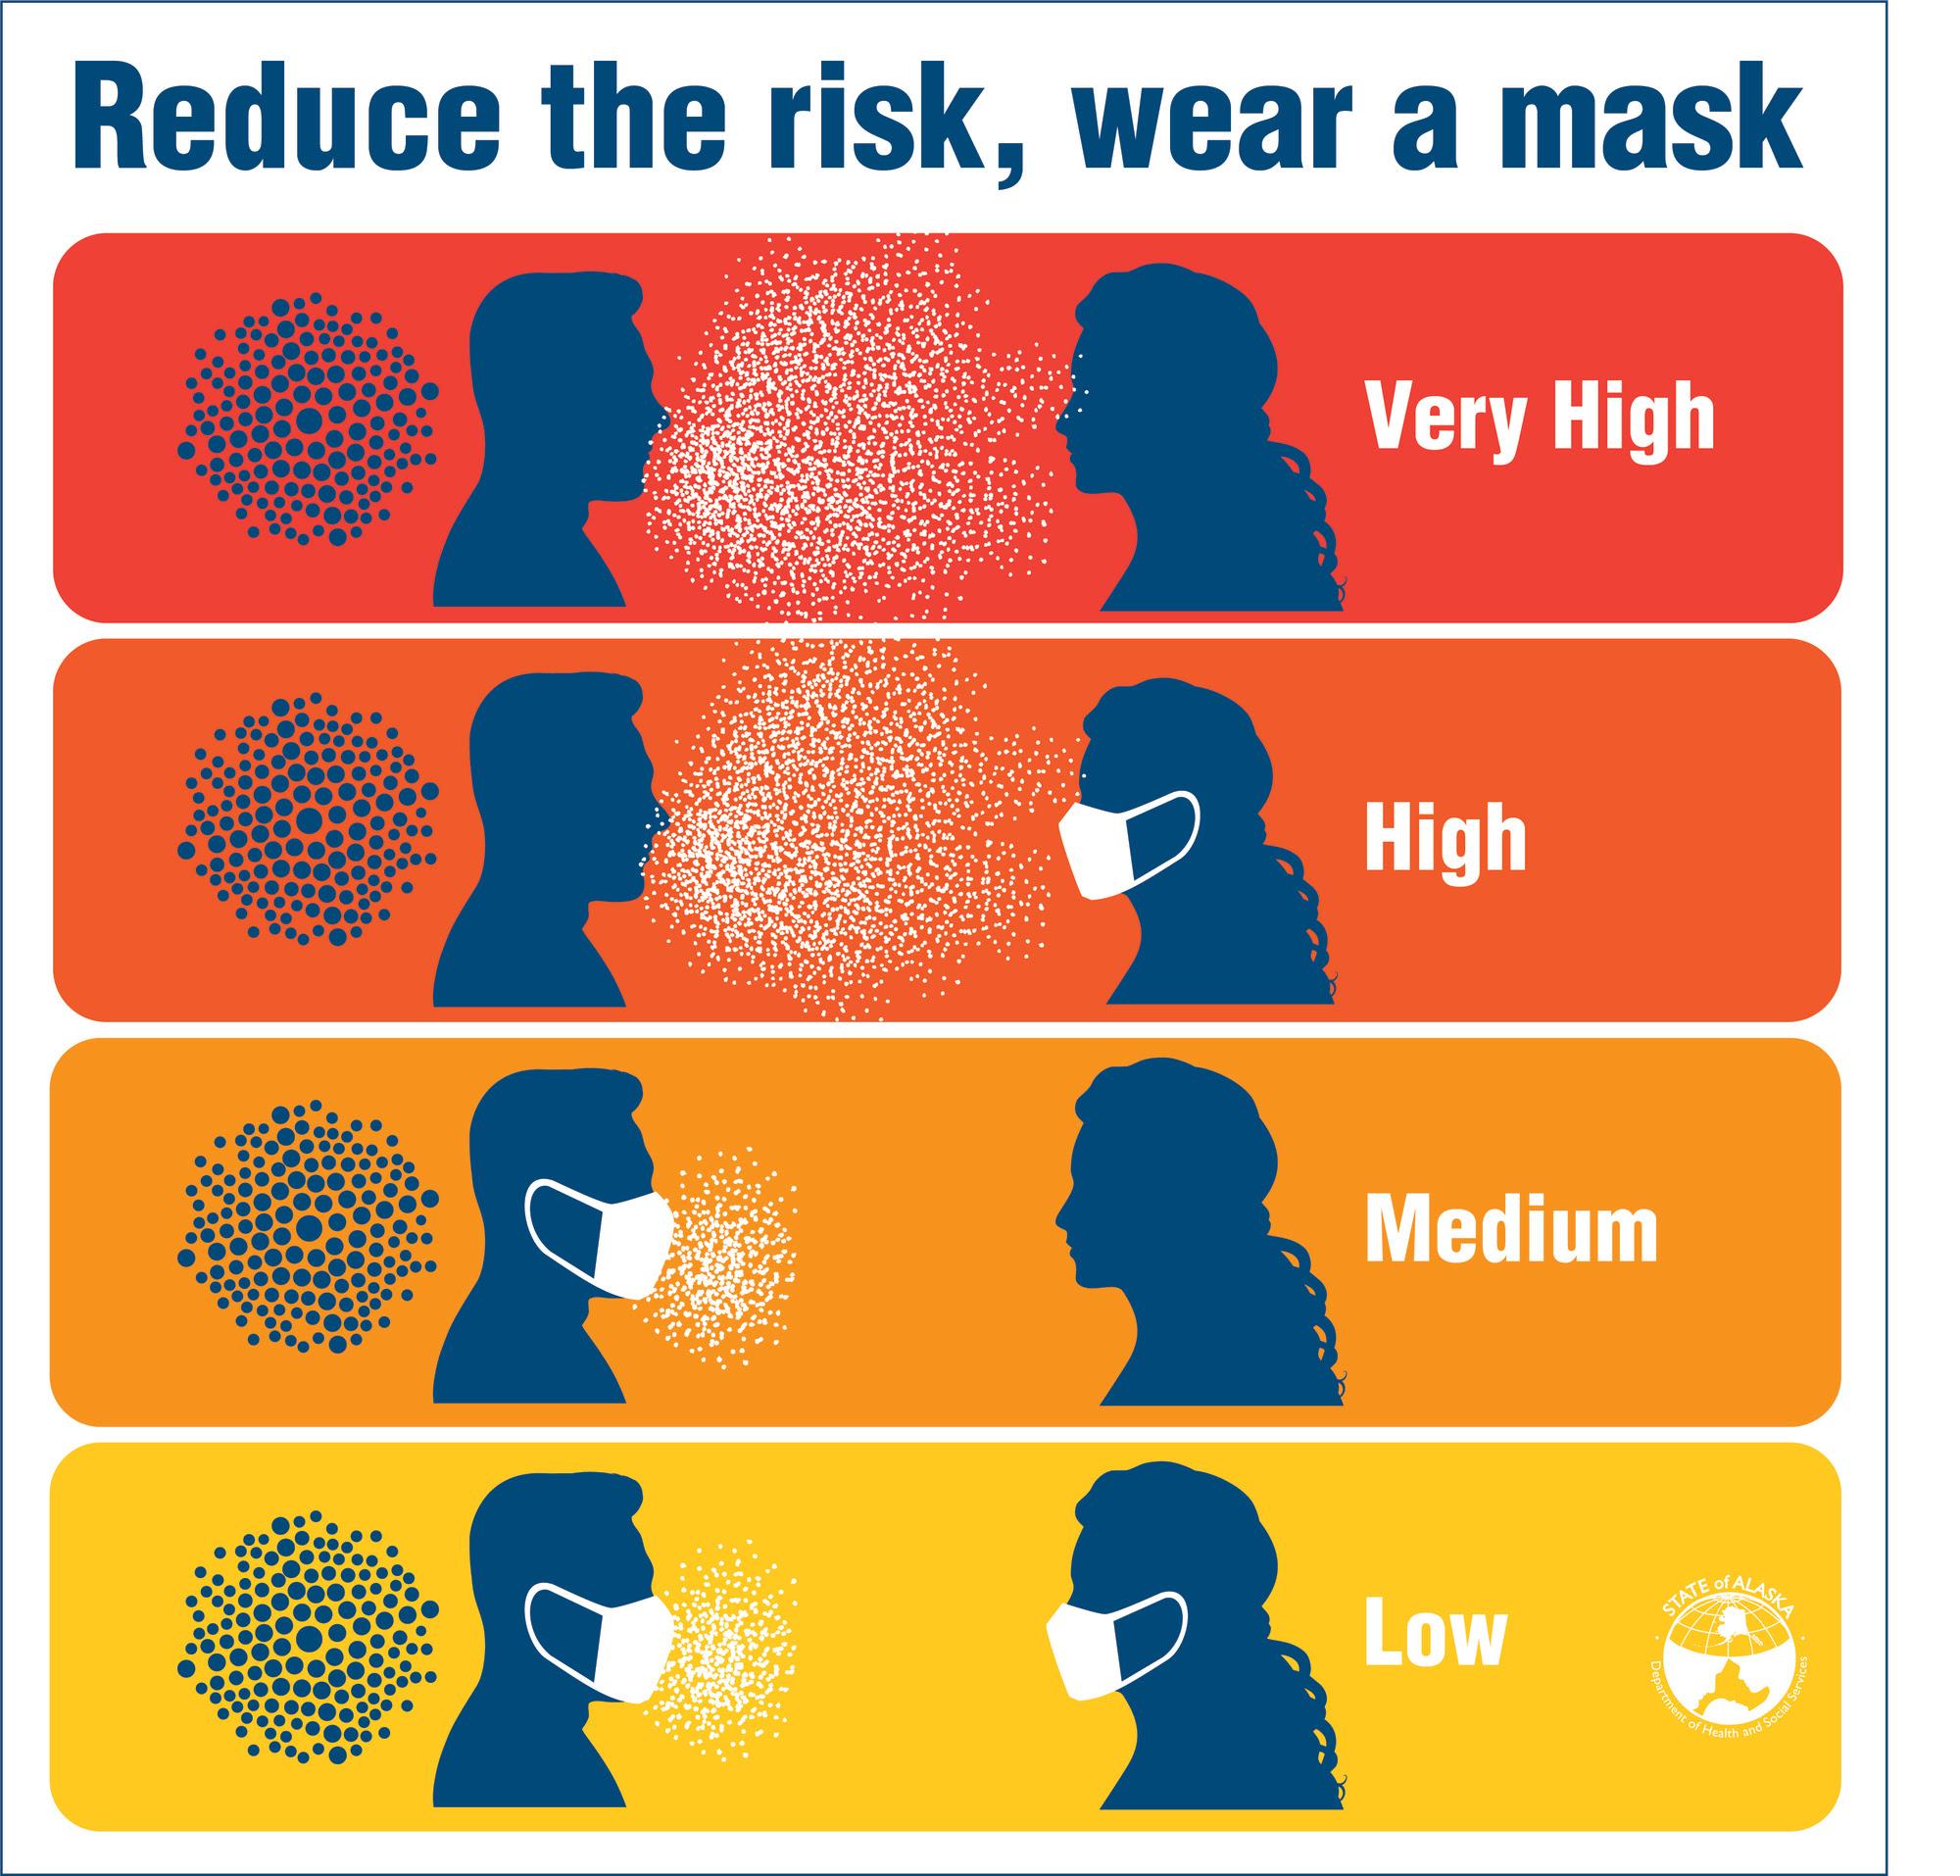 Why Wear Masks